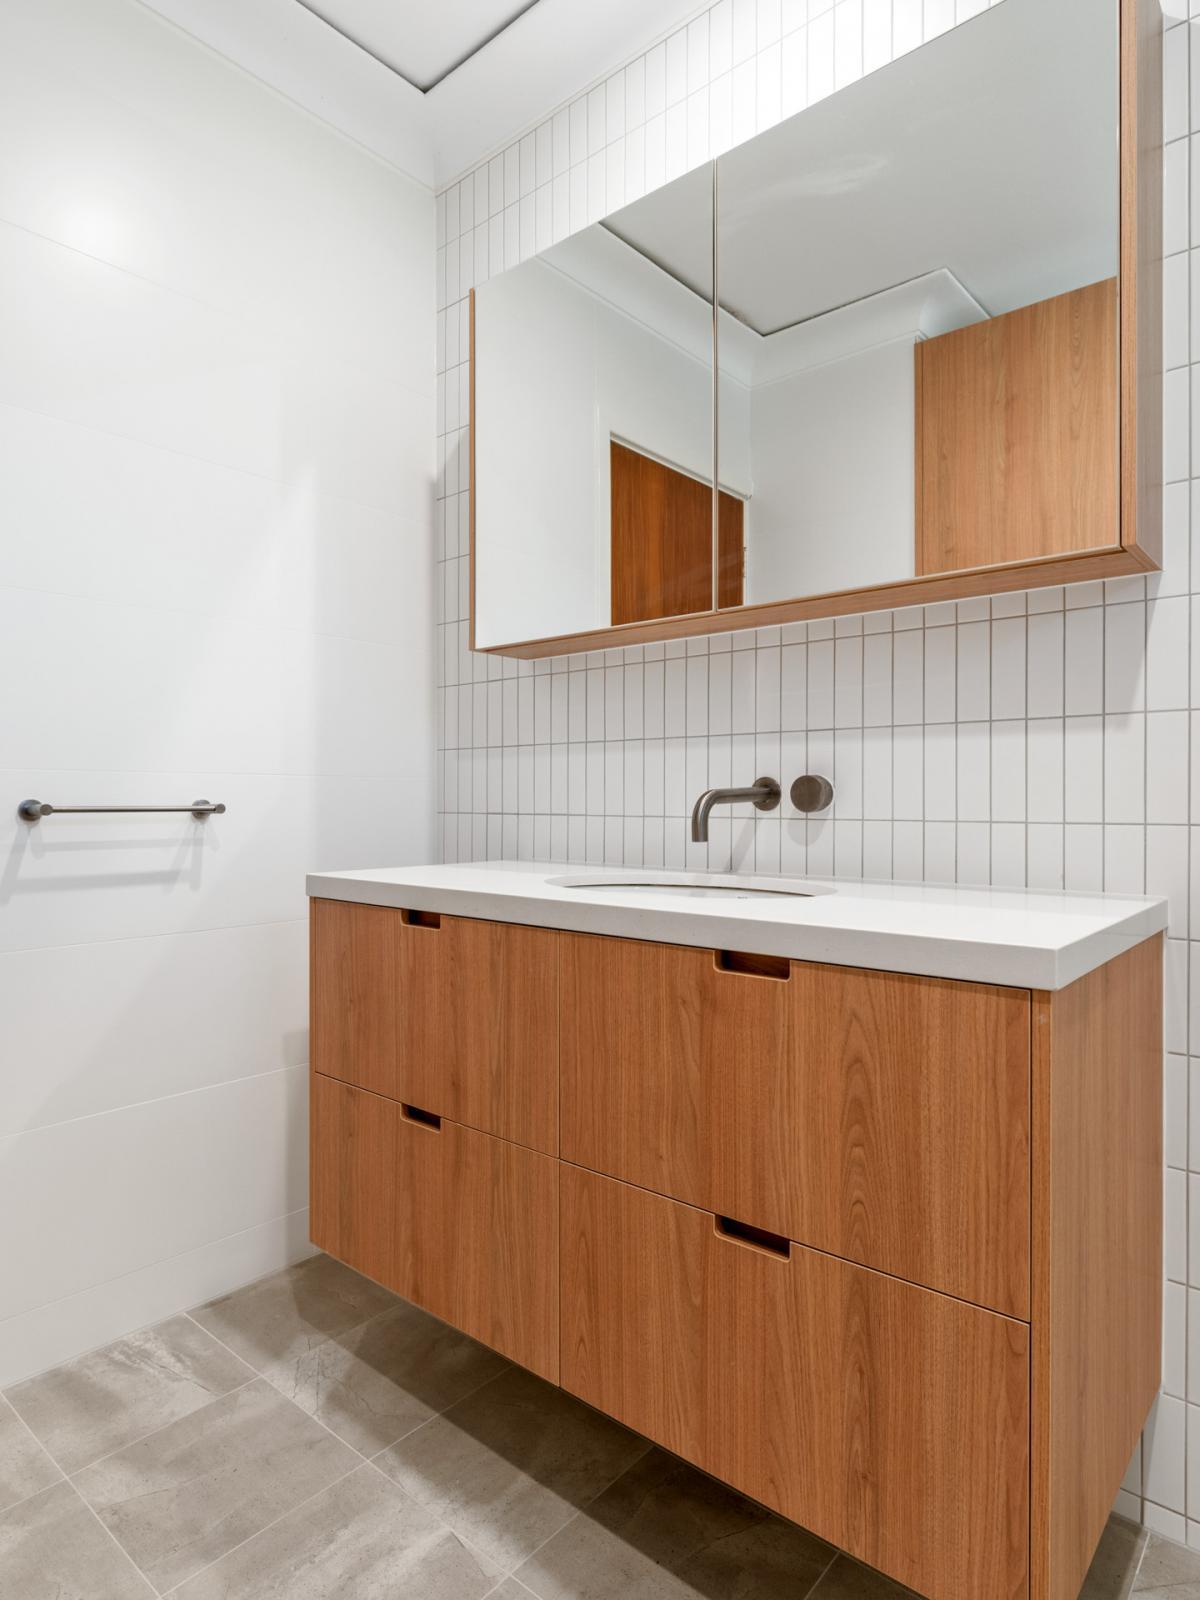 Reece bathrooms gallery timber vanity